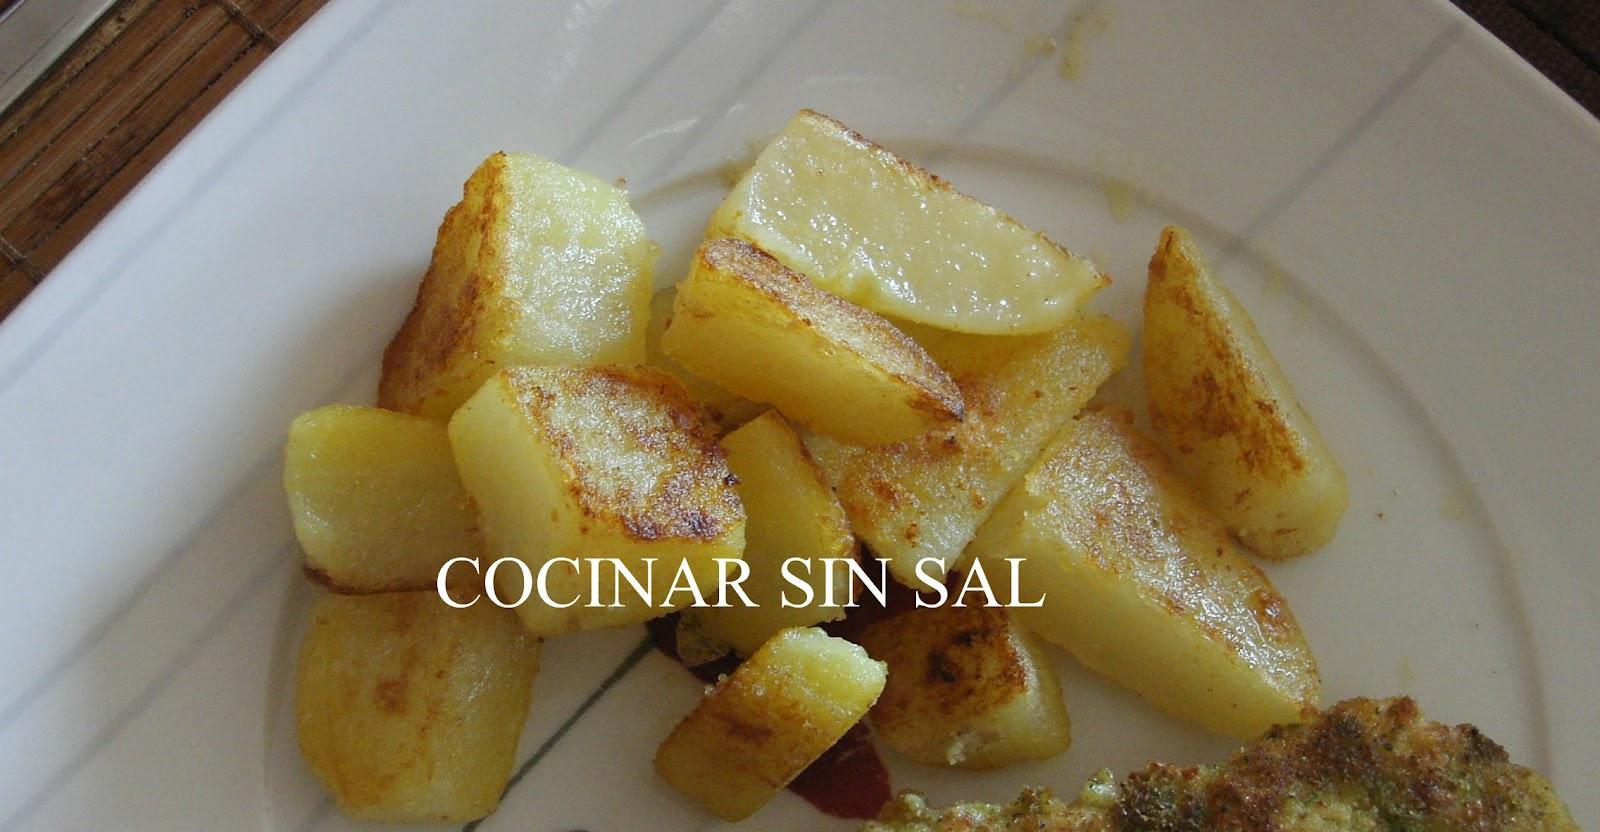 Cocinar sin sal patatas salteadas sin sal - Cocinar sin sal ...